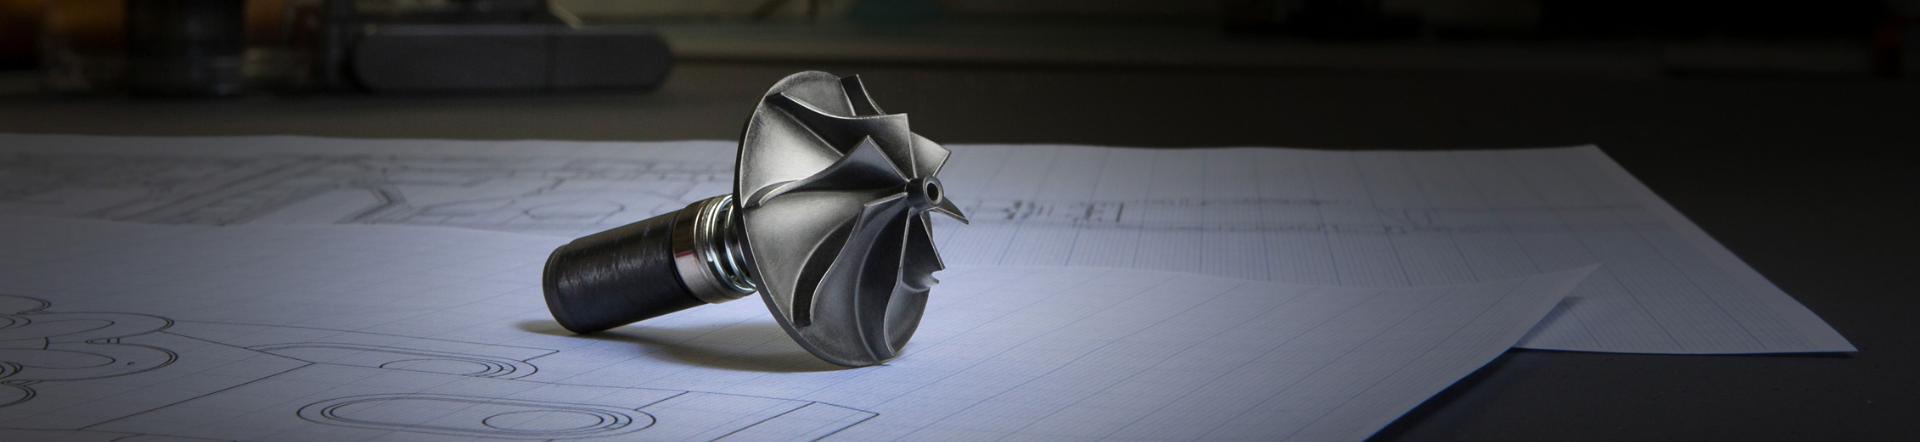 محرك دايسون الرقمي V8